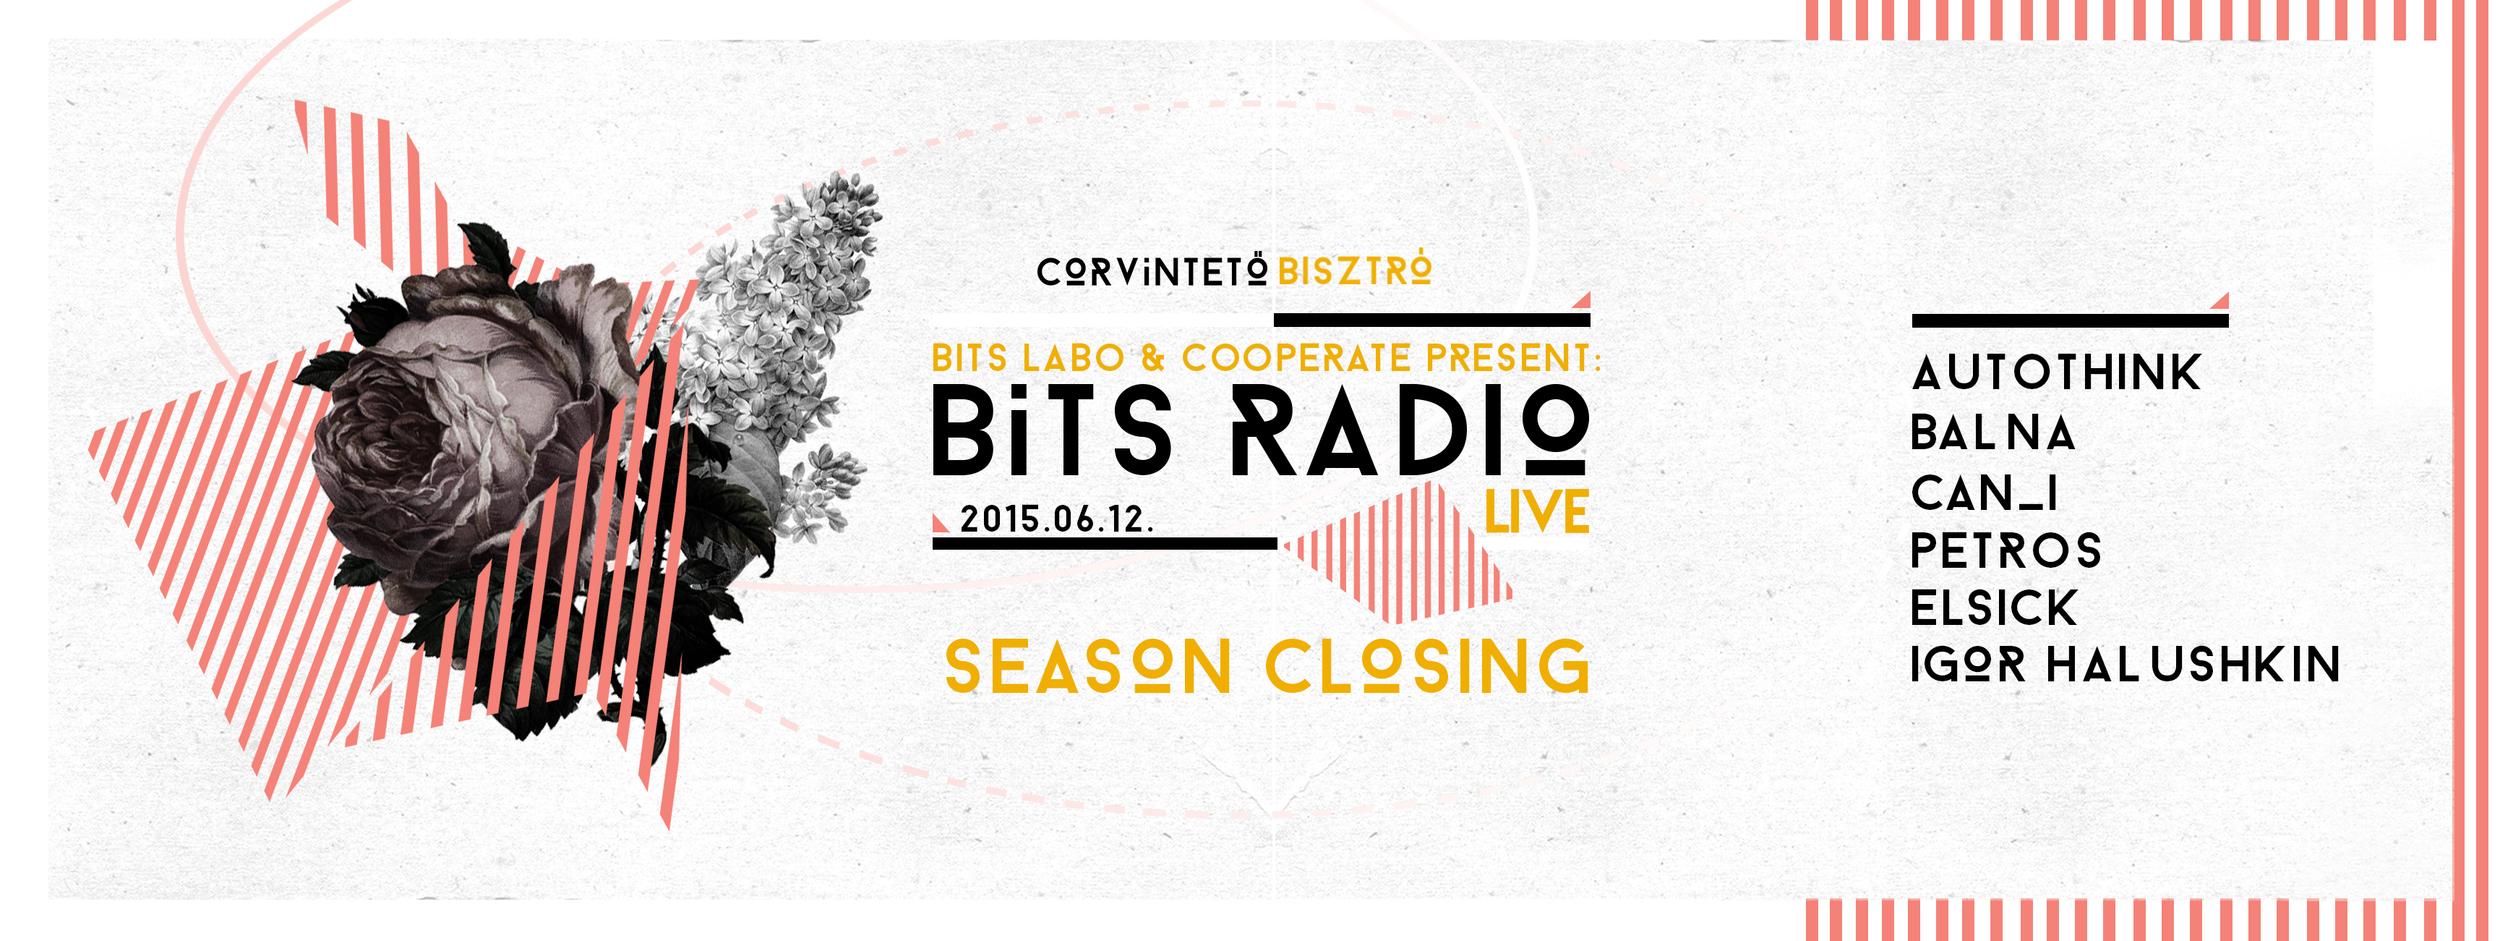 BiTS_radio_LiVE_eventbanner_002.jpg